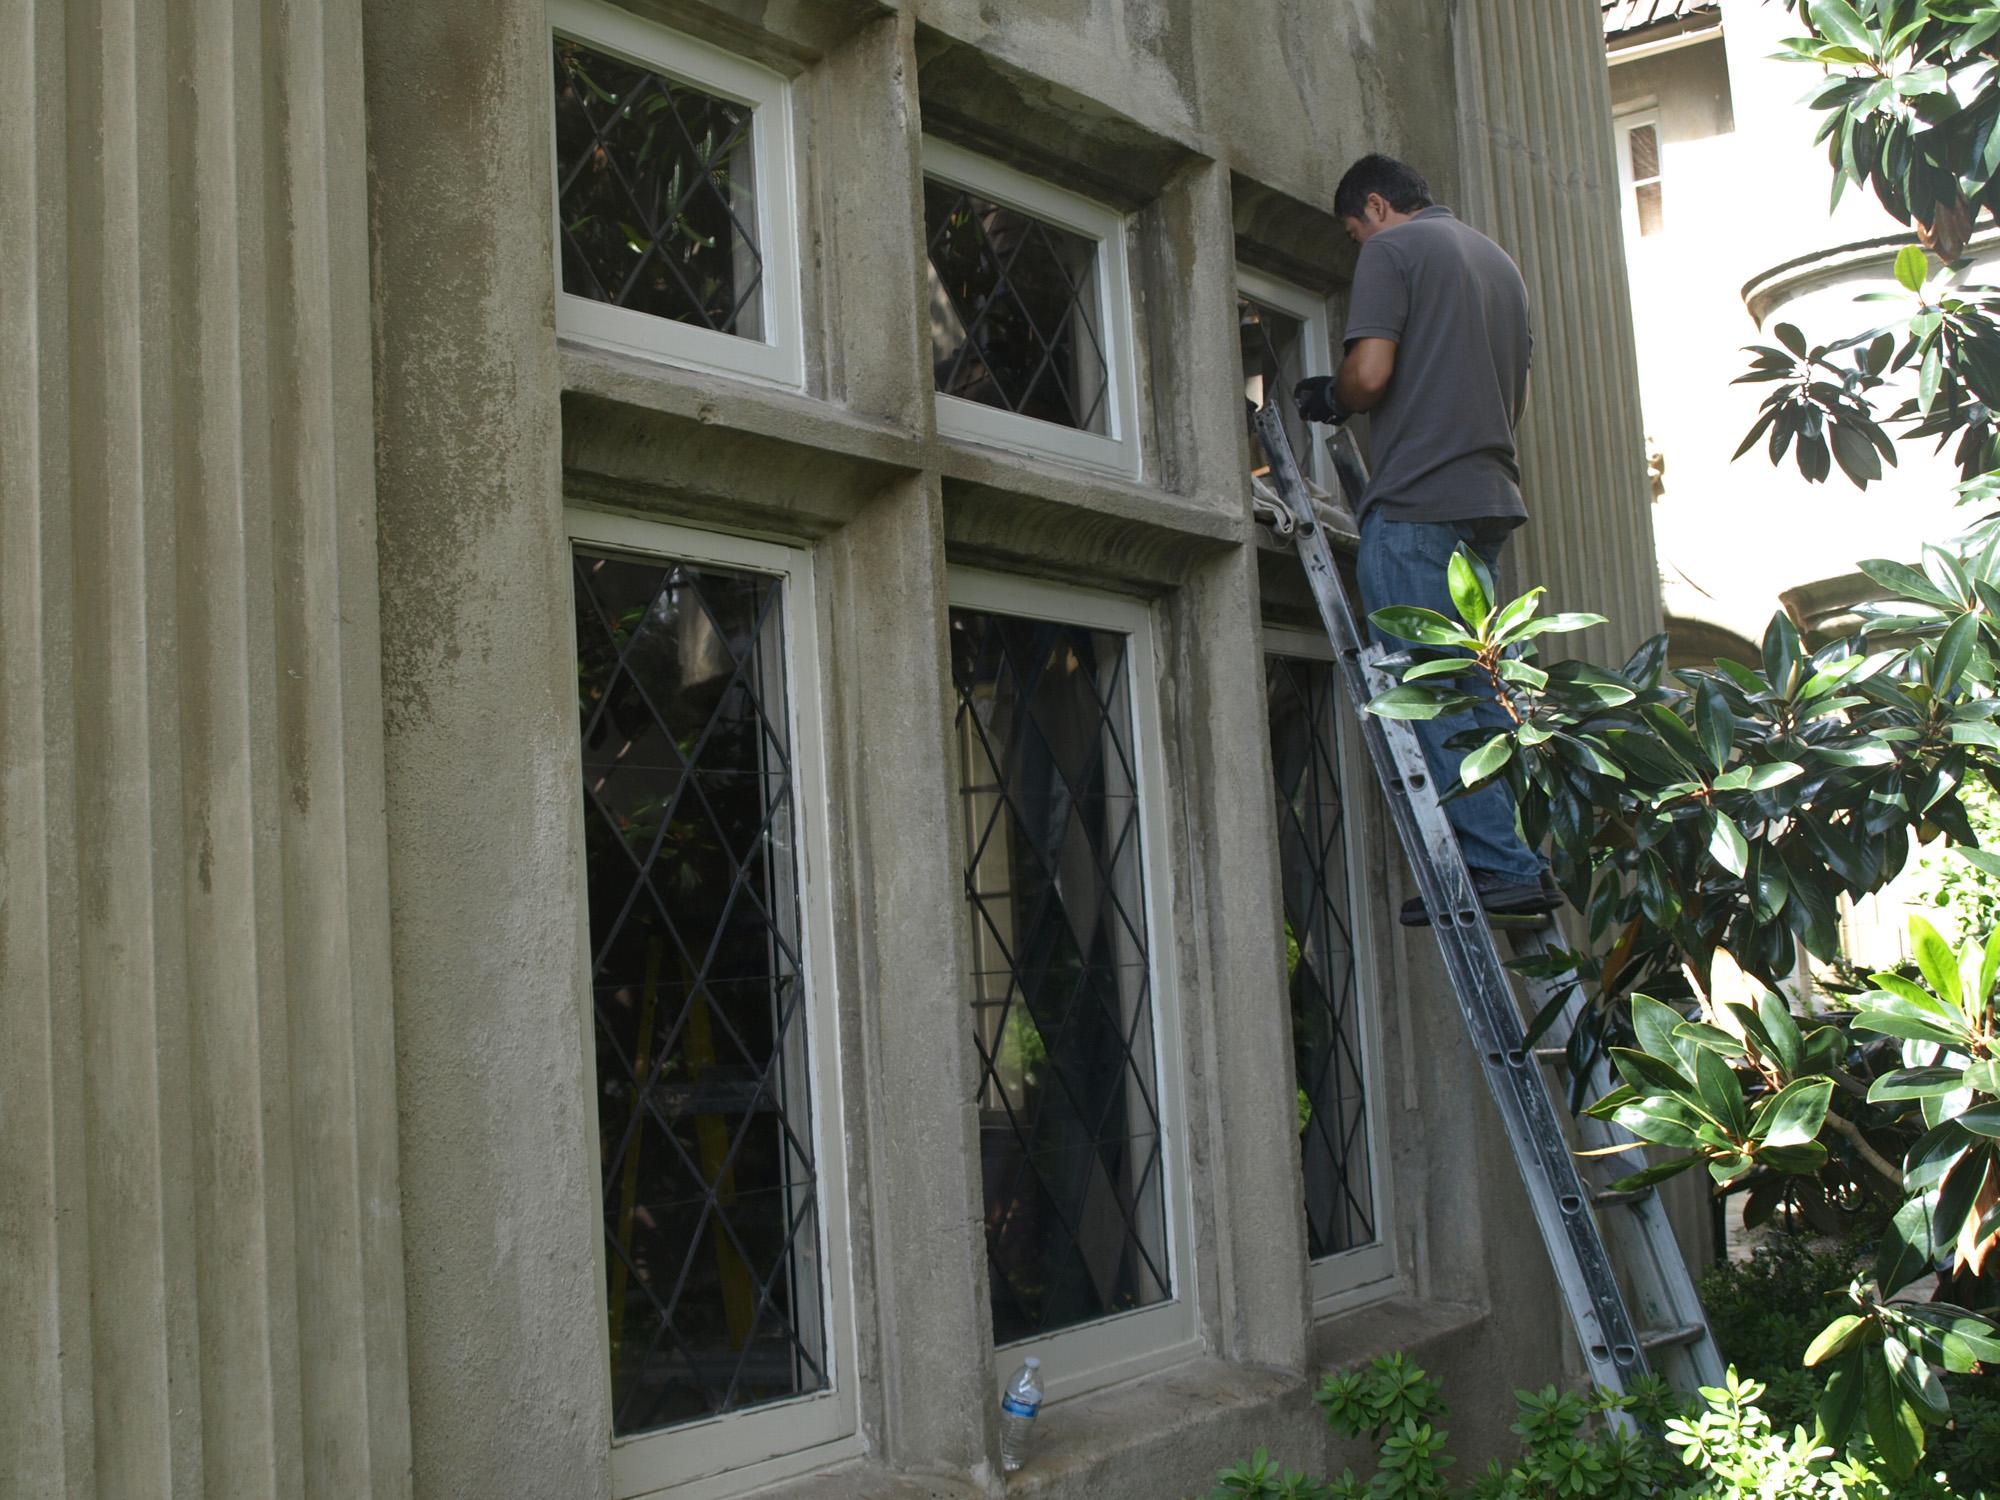 Historic Leaded Glass Restoration, Concave/Convex design - AdammsGallery